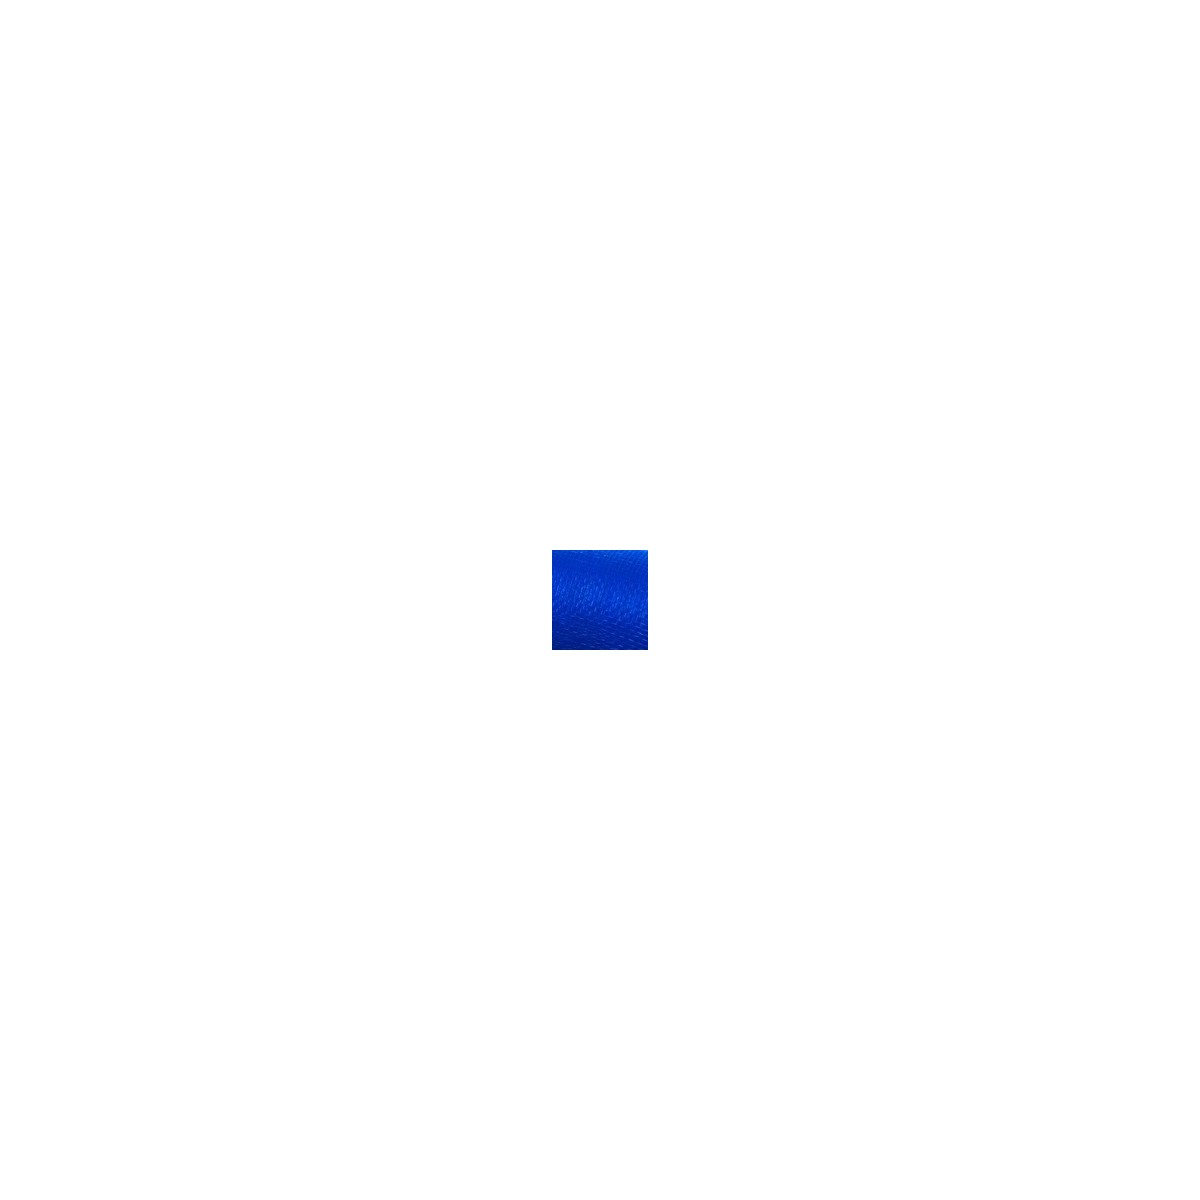 Deconet Telo Retina Cm.54x9,2 Mt. Blu